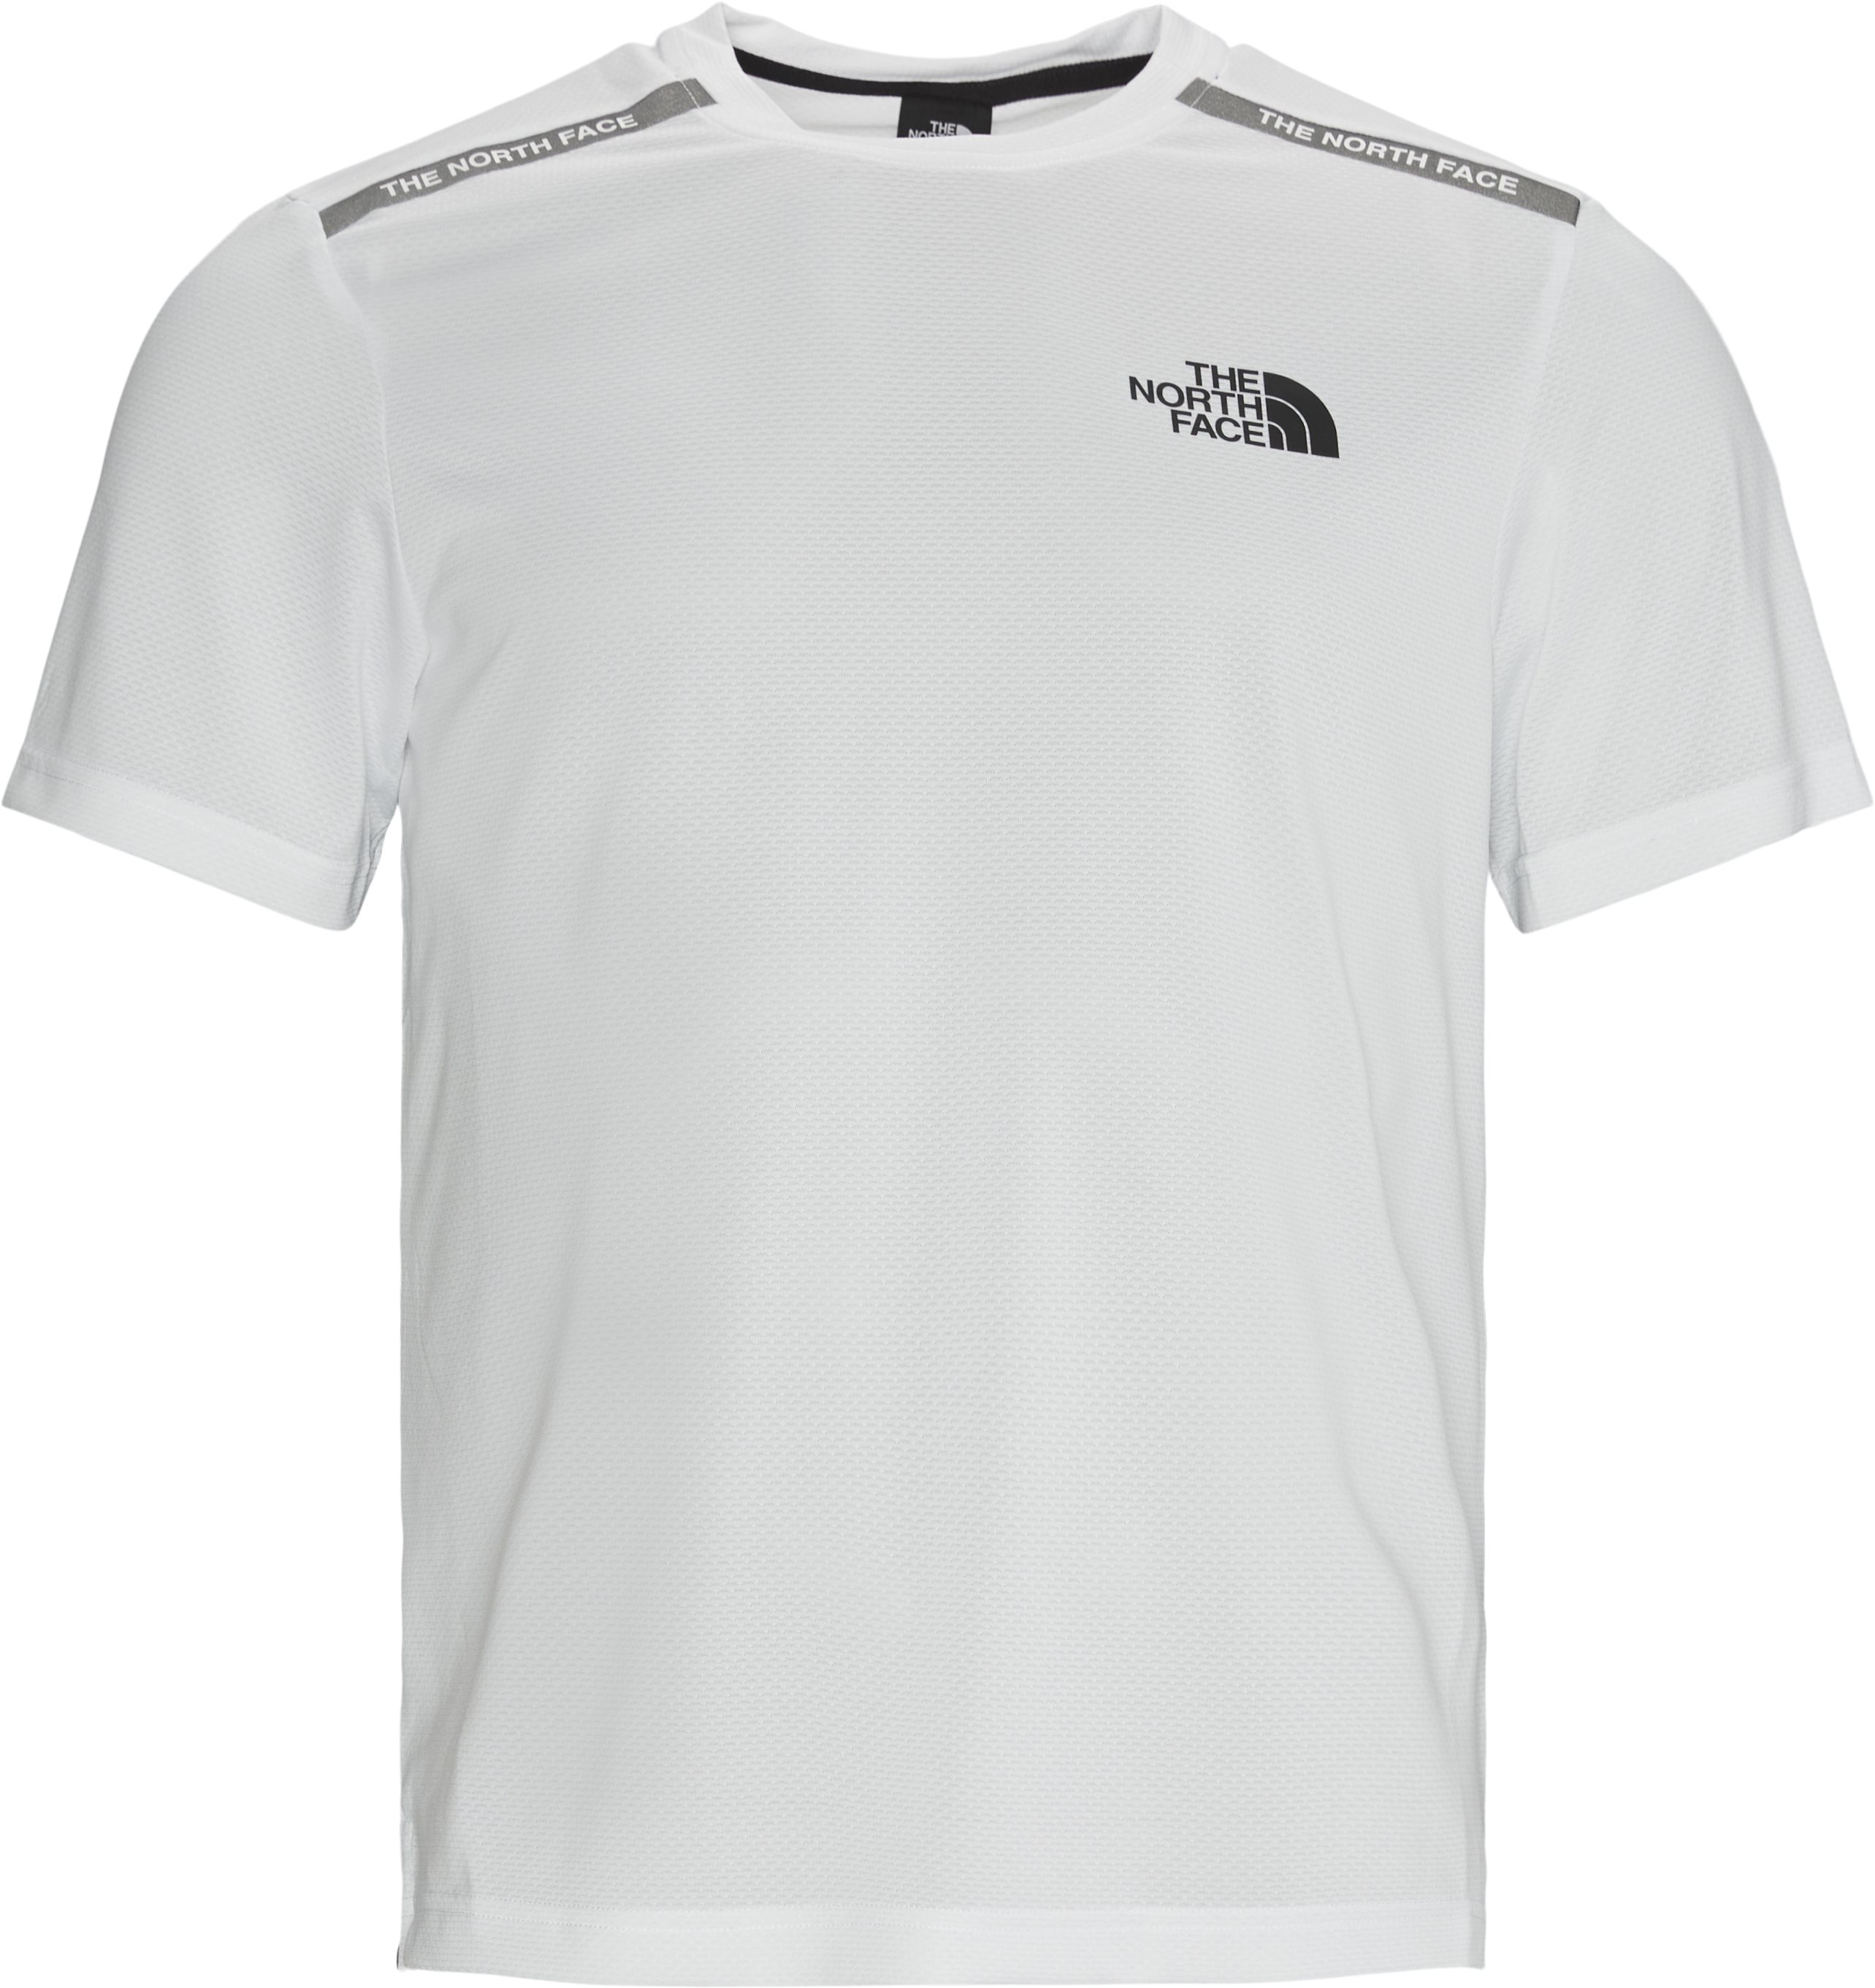 Eu Tee - T-shirts - Regular fit - White